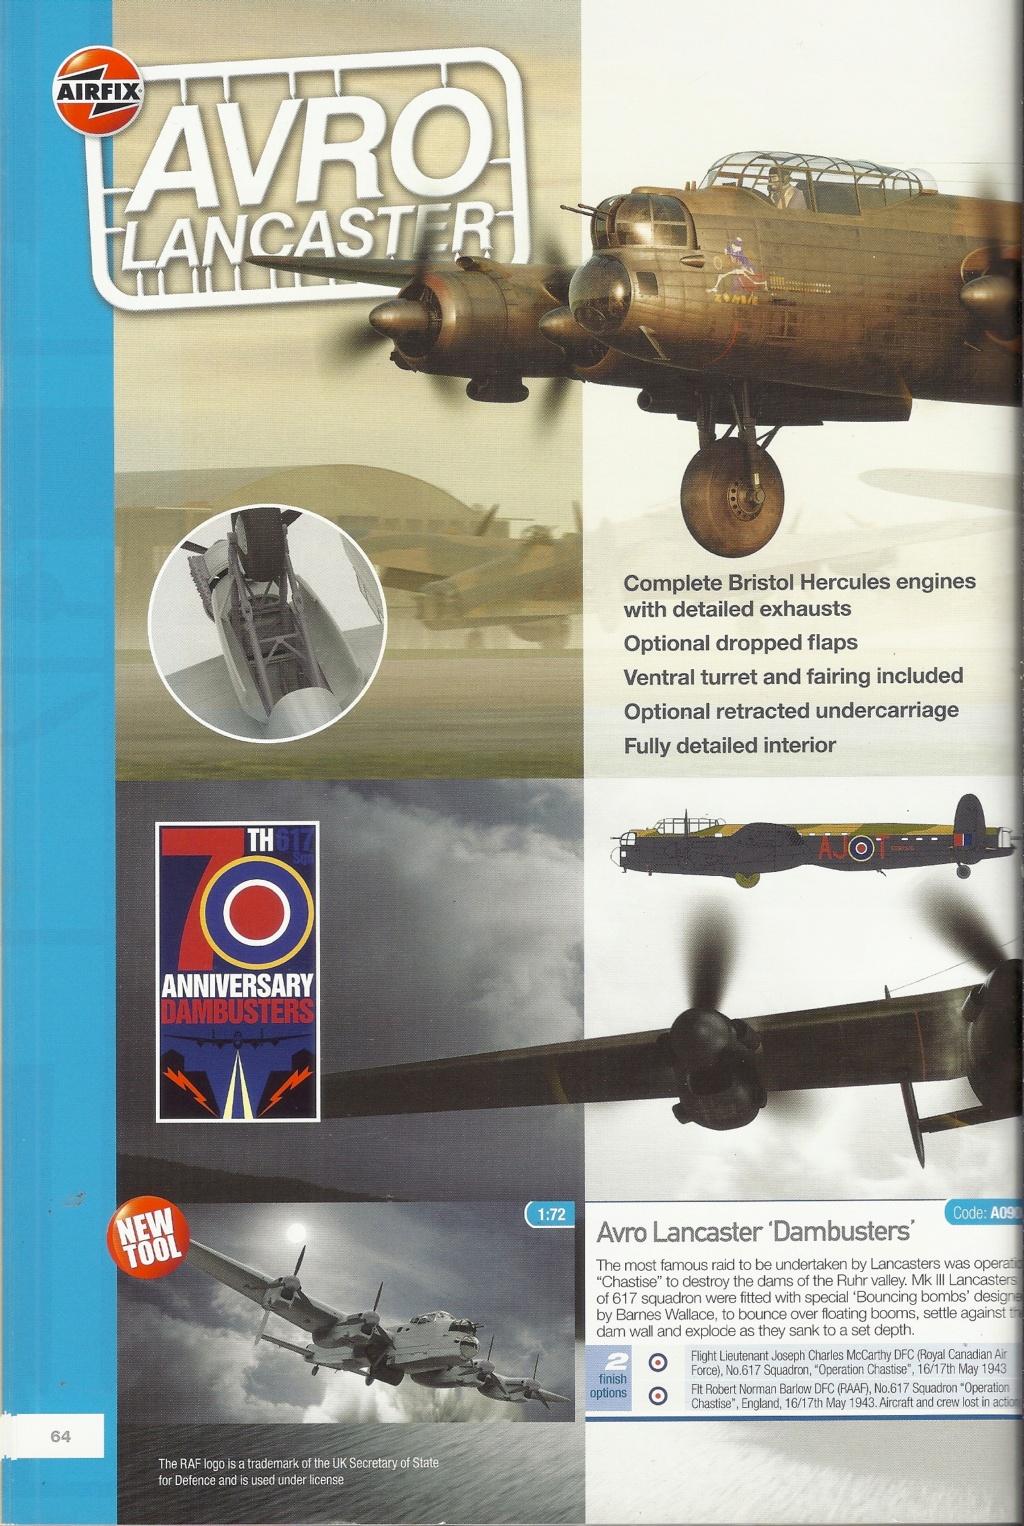 [AIRFIX 2013] Catalogue 2013 Airf1621